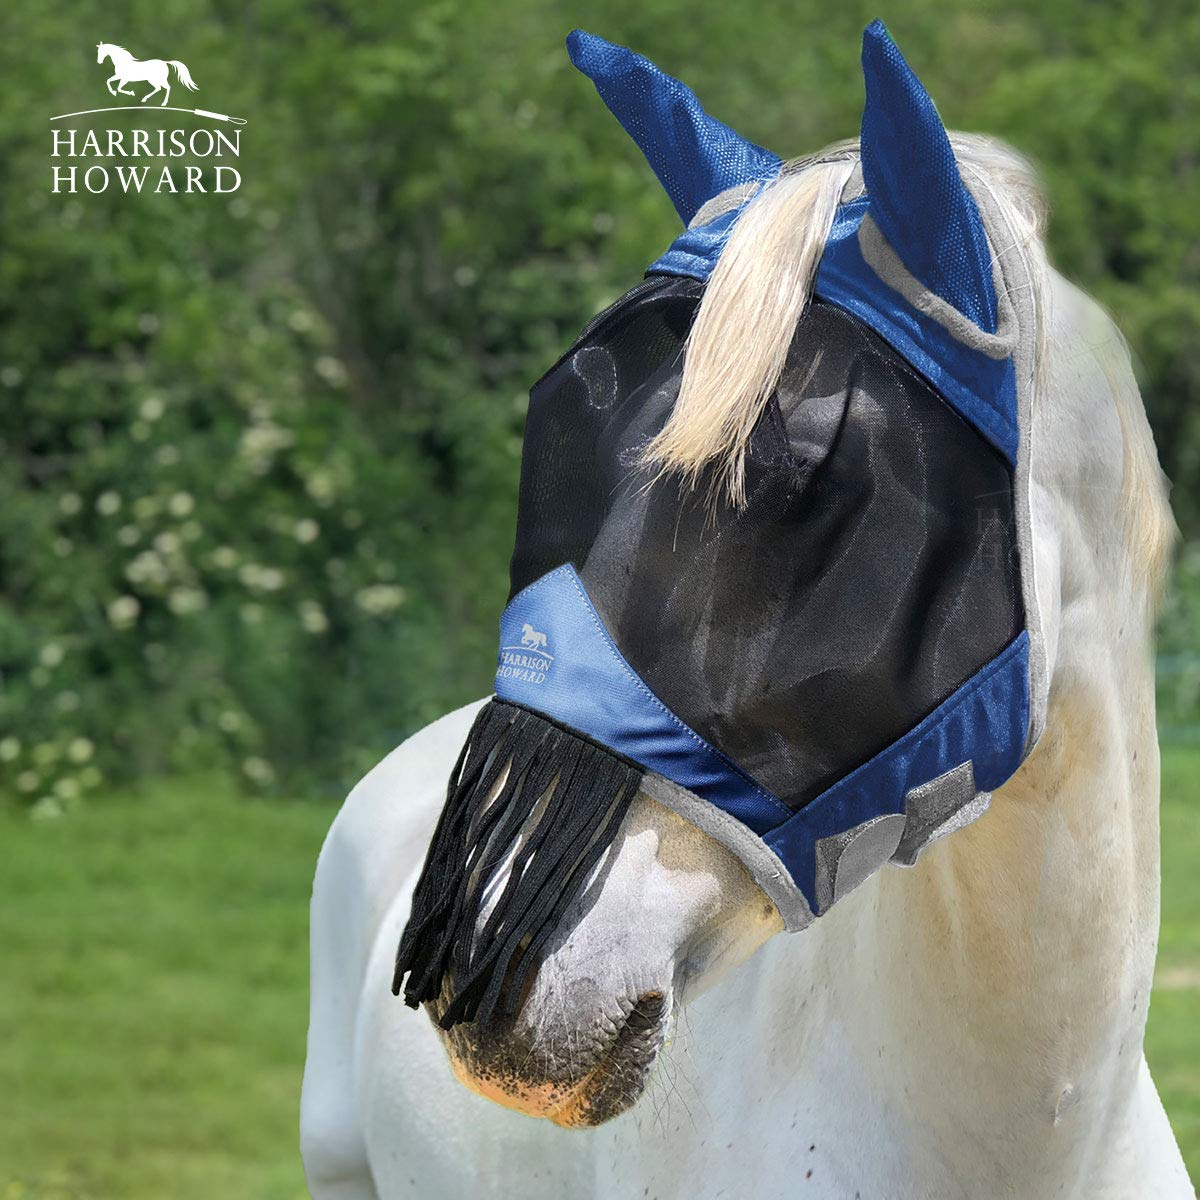 Harrison Howard CareMaster Horse Fly mask with Ears and Nose Fringe Fly Protector Defender Mask Aquamarine